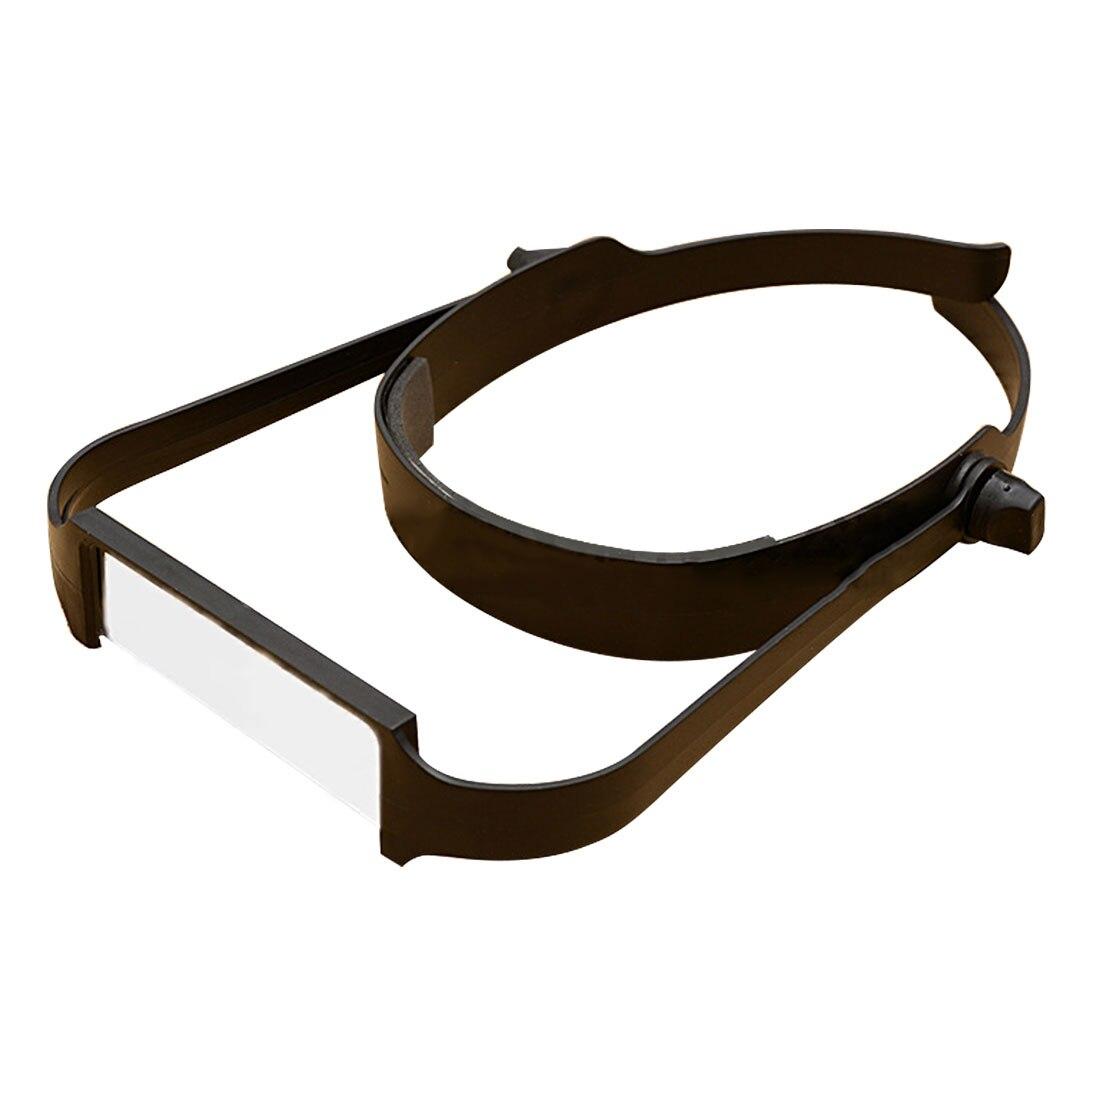 Hot! 1.6x 2.0x 2.5x 3.5x Lente Substituível Cabeça Headband Lupa Lupa Lupa lupa Lente de vidro óptico